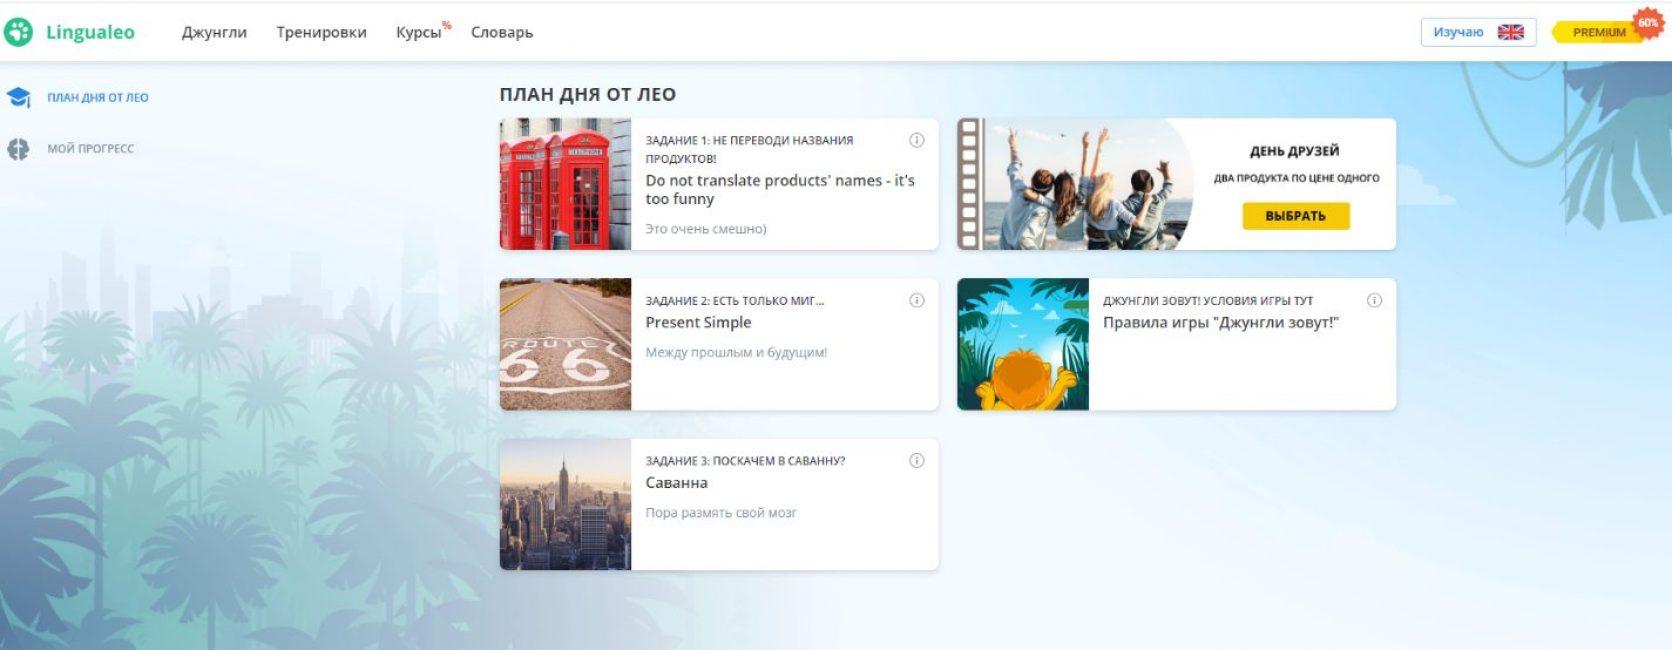 4. Lingualeo — английский язык онлайн